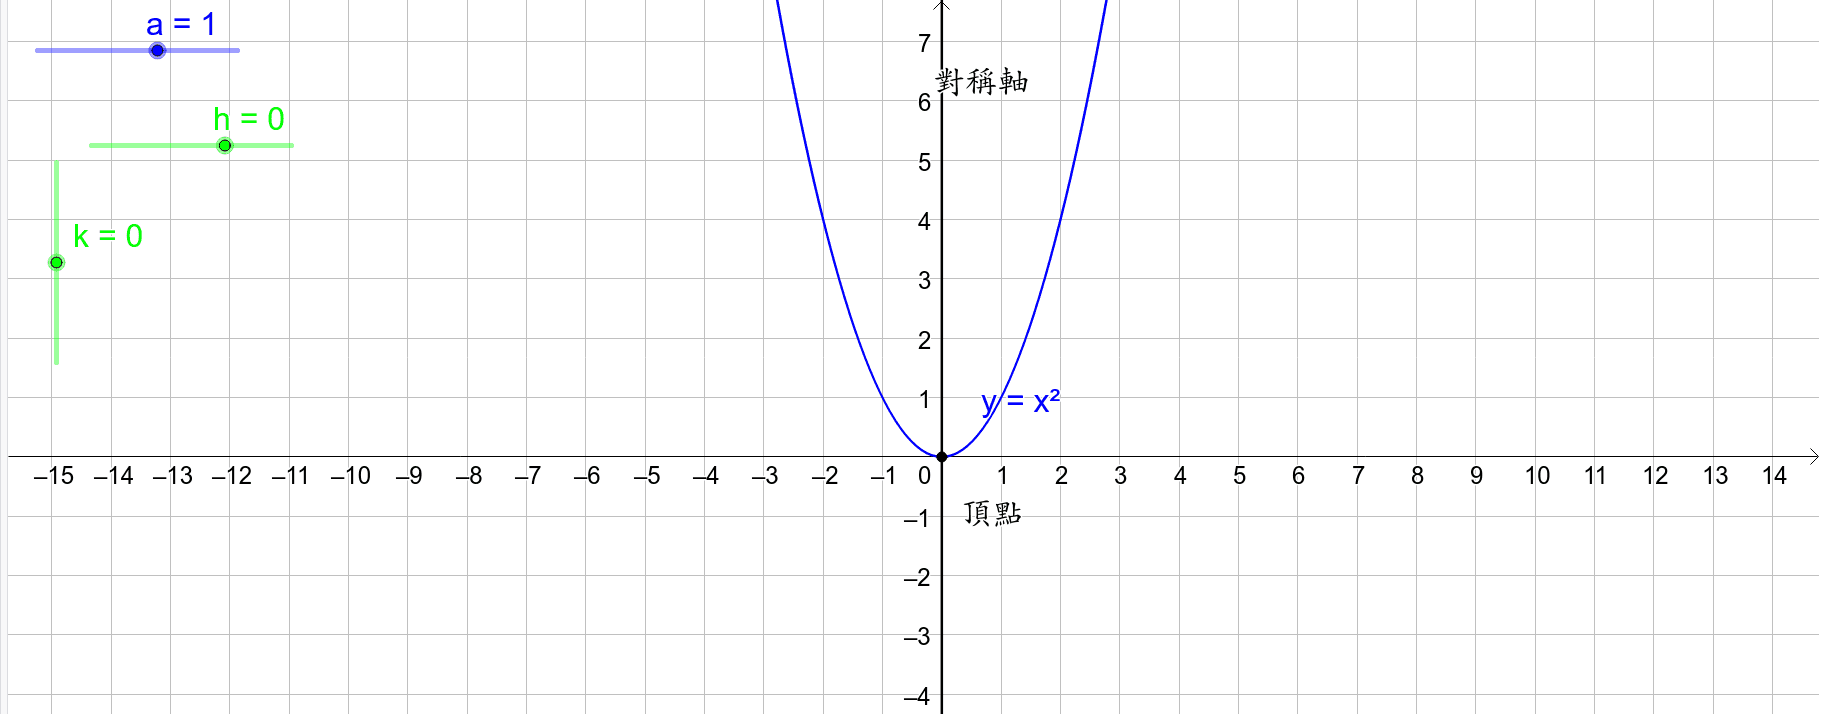 y=a(x-h)^2+k